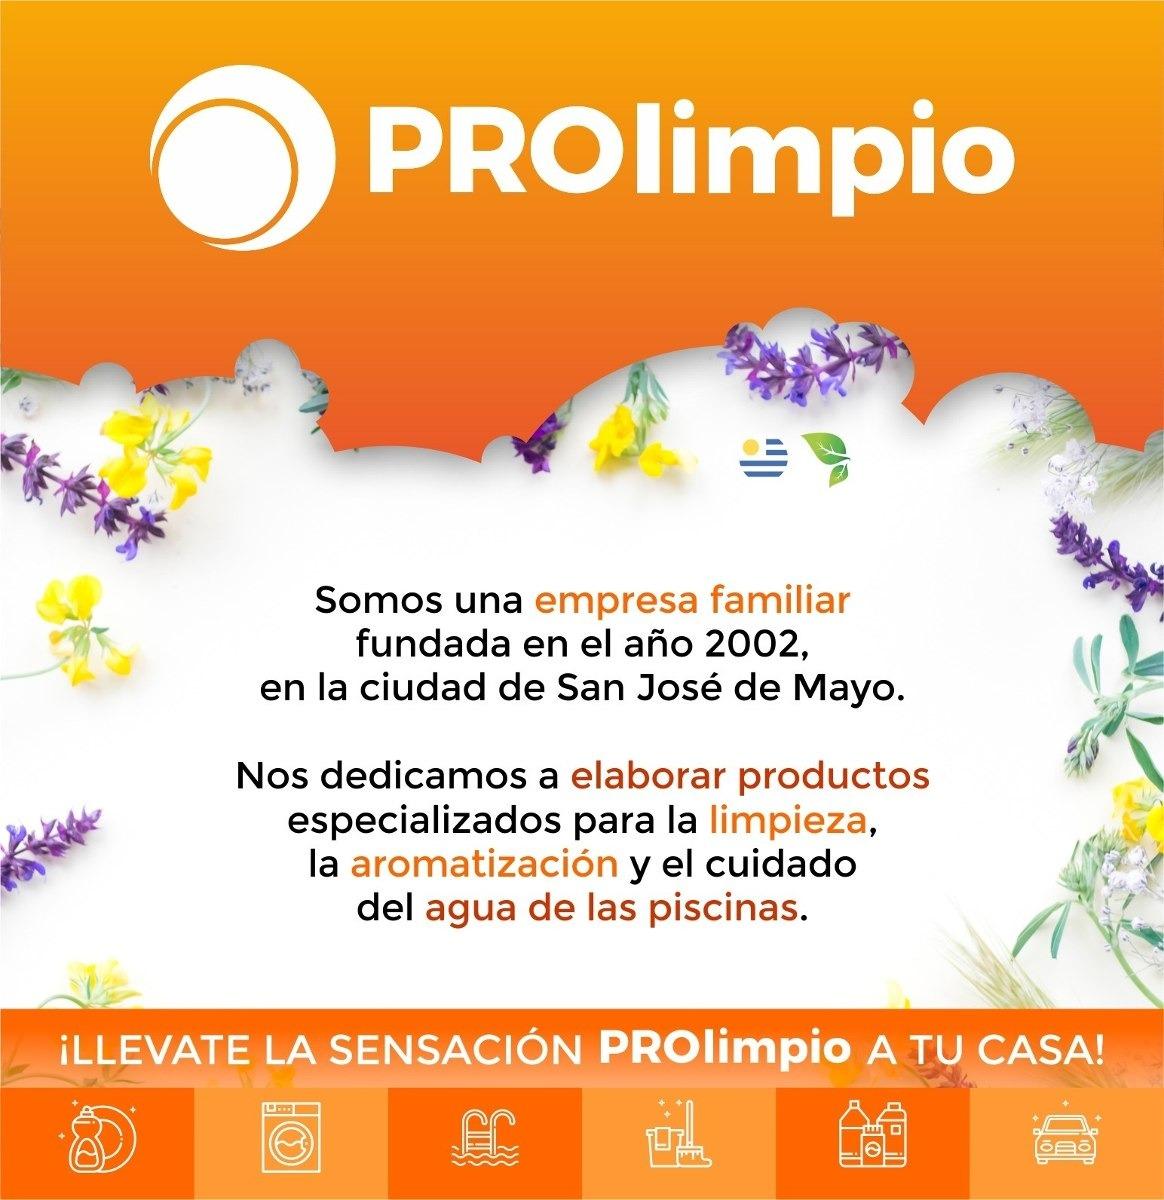 a788b5d23d8a Kit De Limpieza Para Lavar Y Perfumar Ropa - Prolimpio